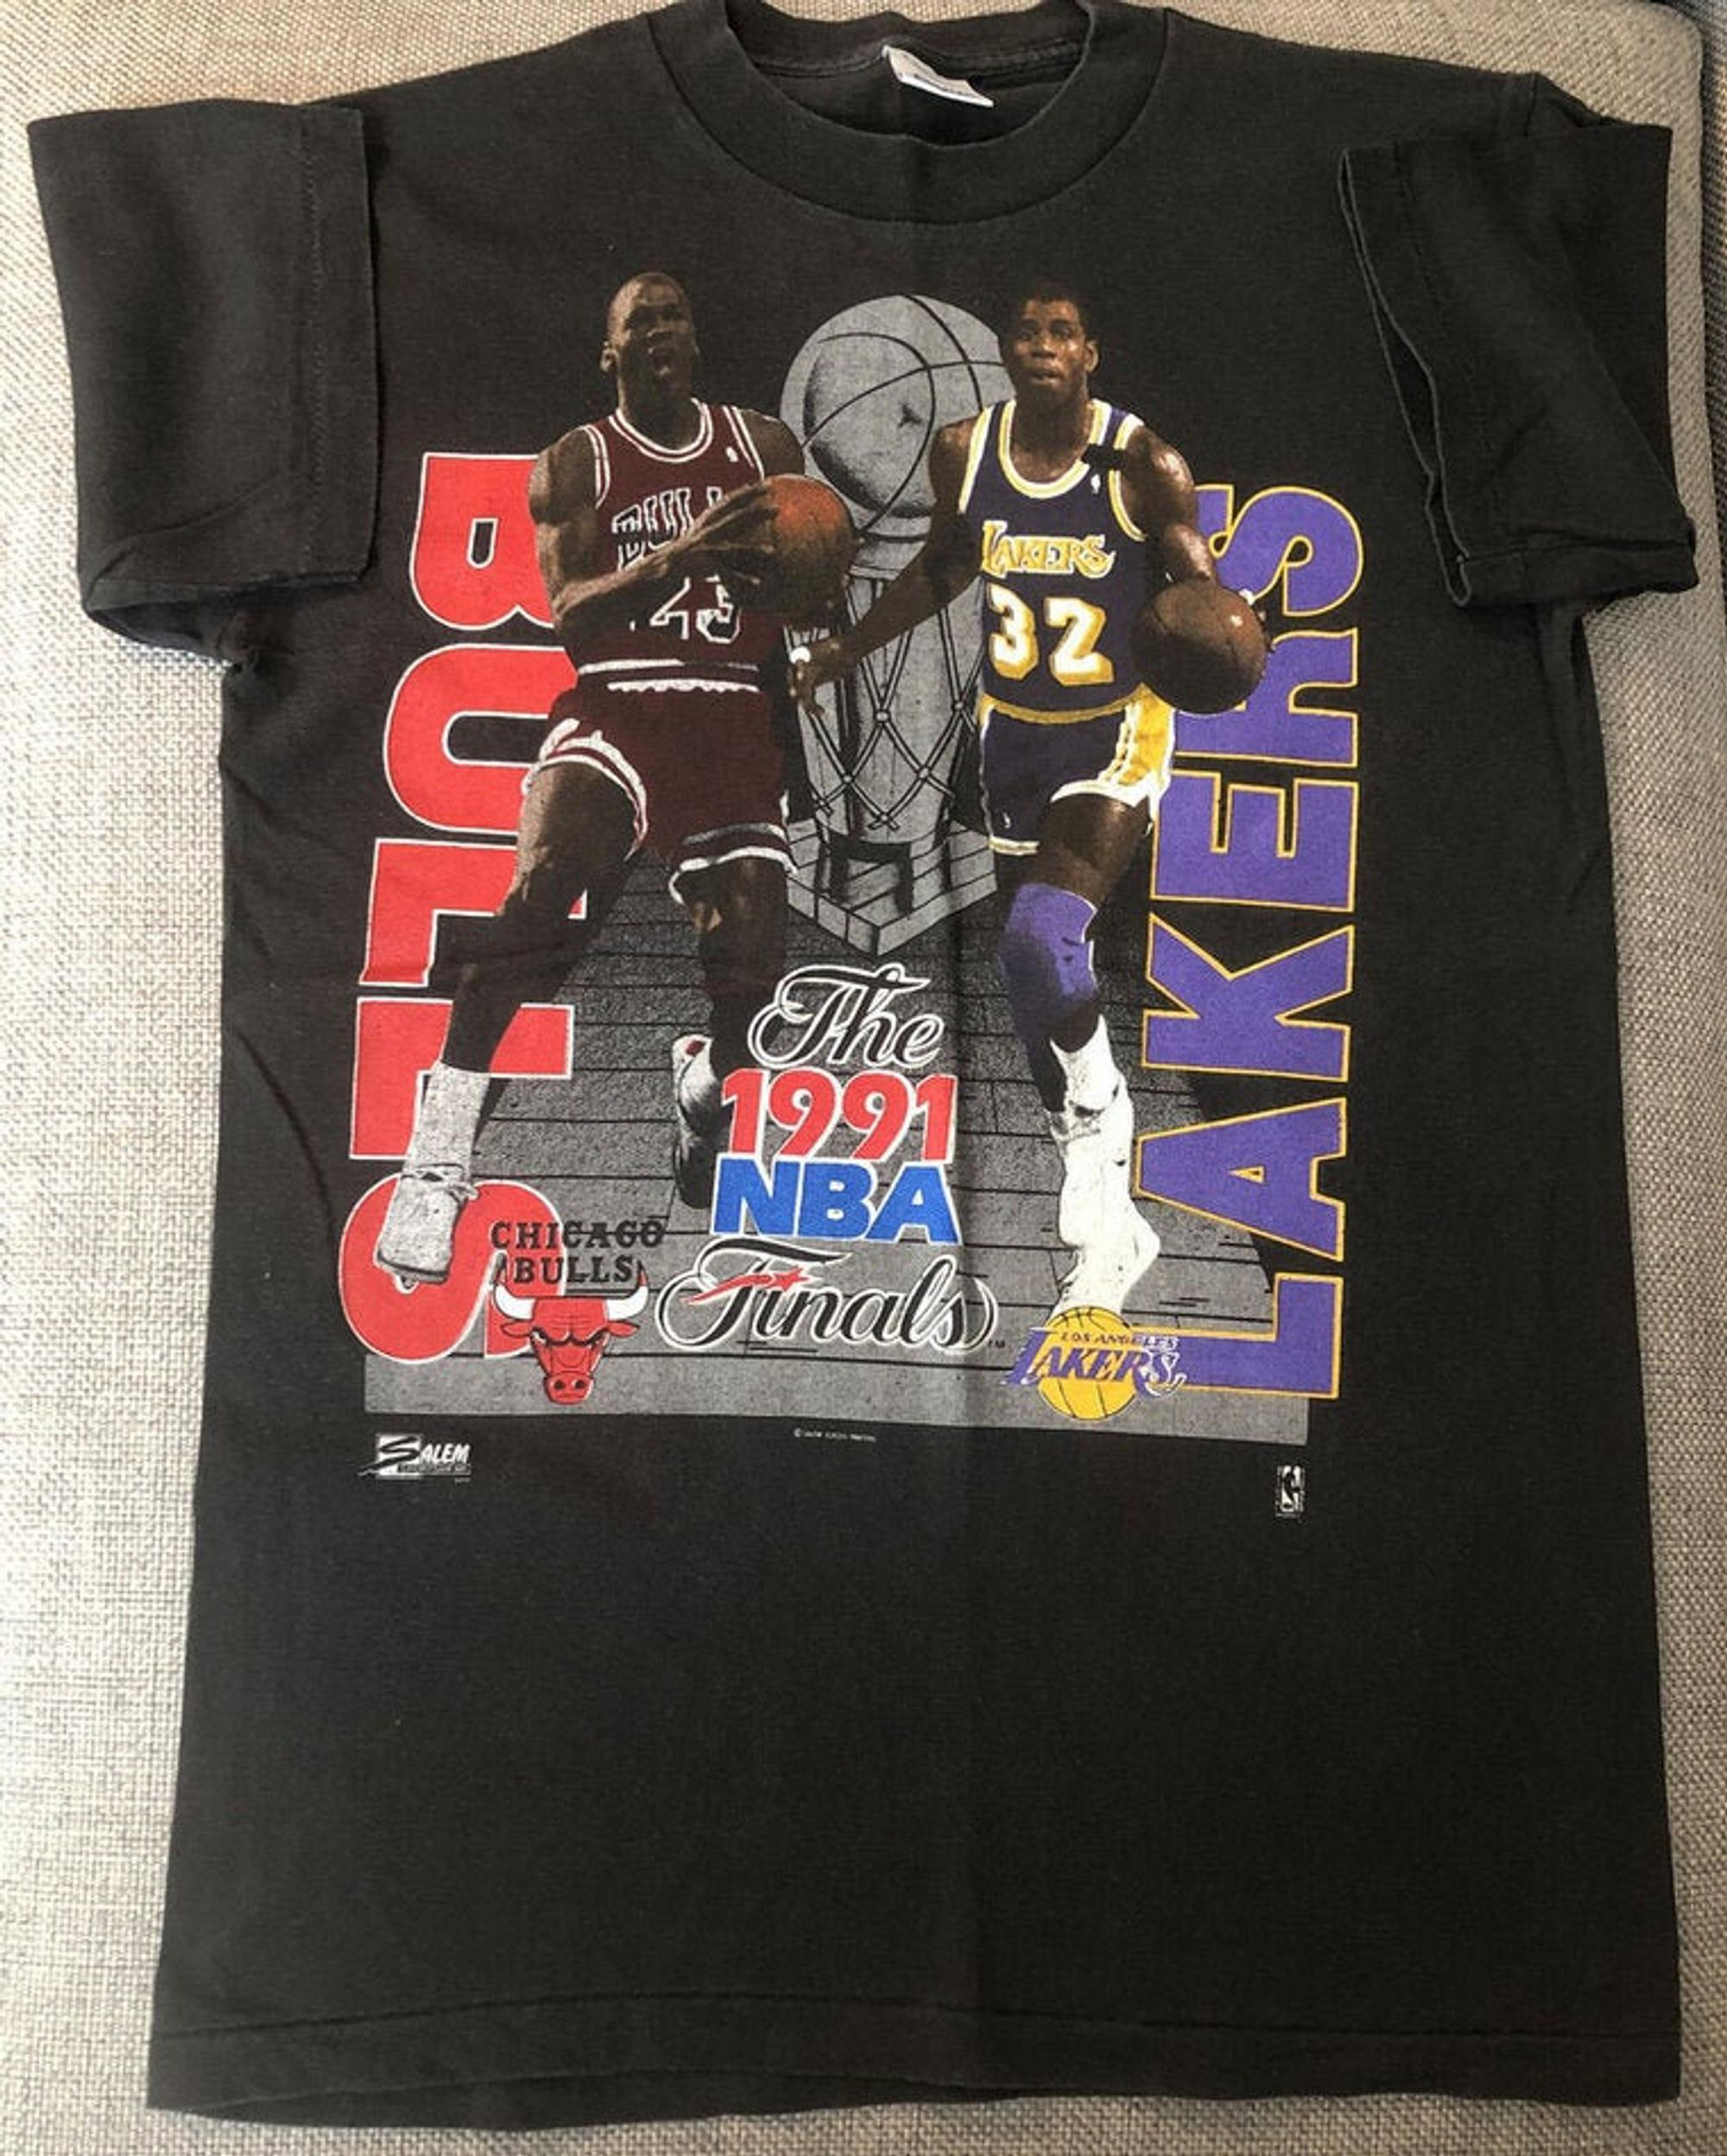 Vintage 1991 NBA Finals Michael Jordan Magic Johnson S Bulls Lakers Los Angeles Lakers Logo Shirt